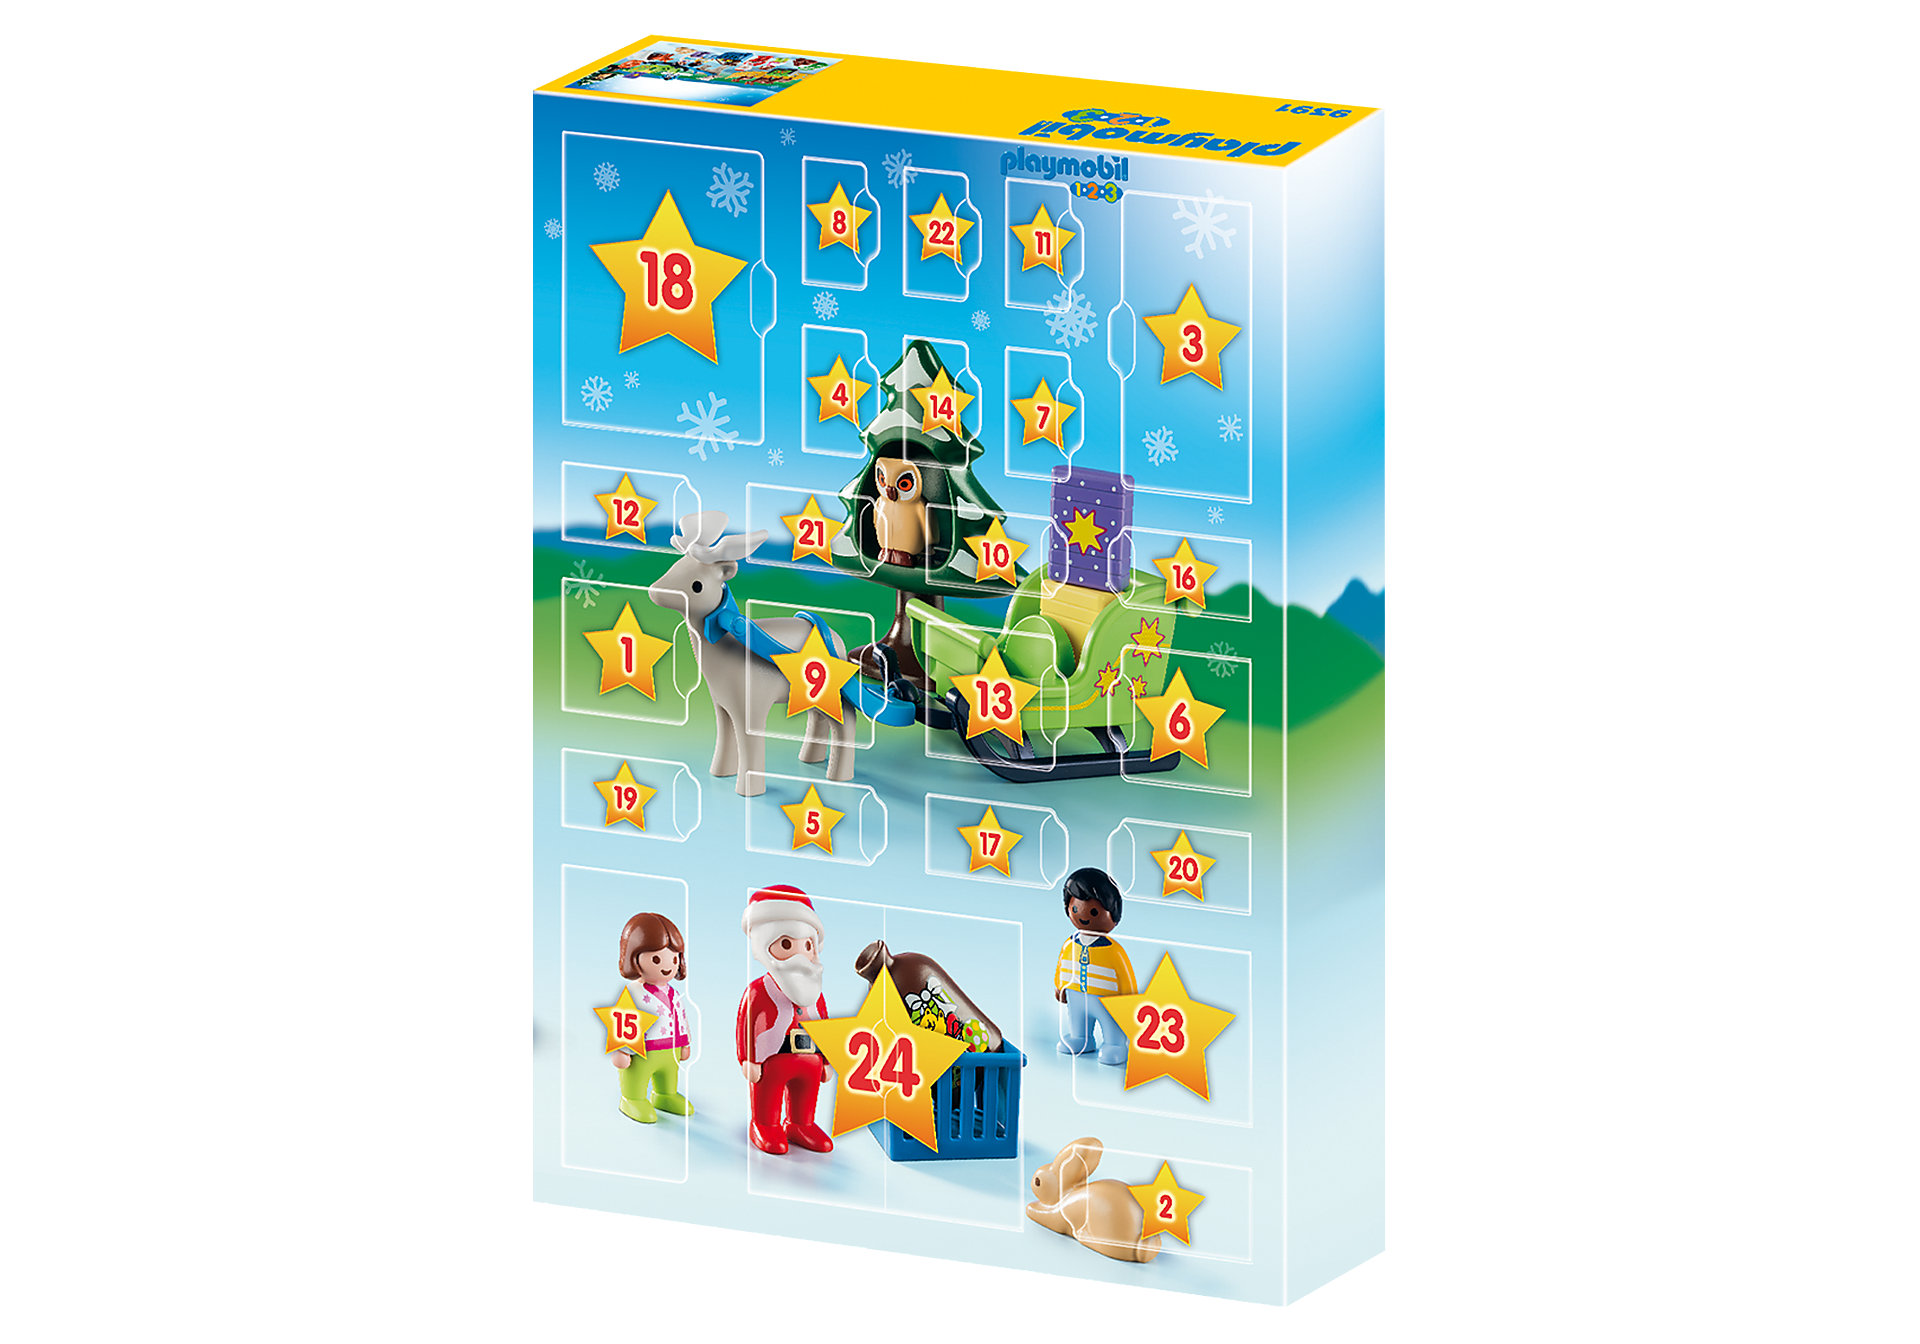 http://media.playmobil.com/i/playmobil/9391_product_extra2/Χριστουγεννιάτικο Ημερολόγιο - Χριστούγεννα στο δάσος